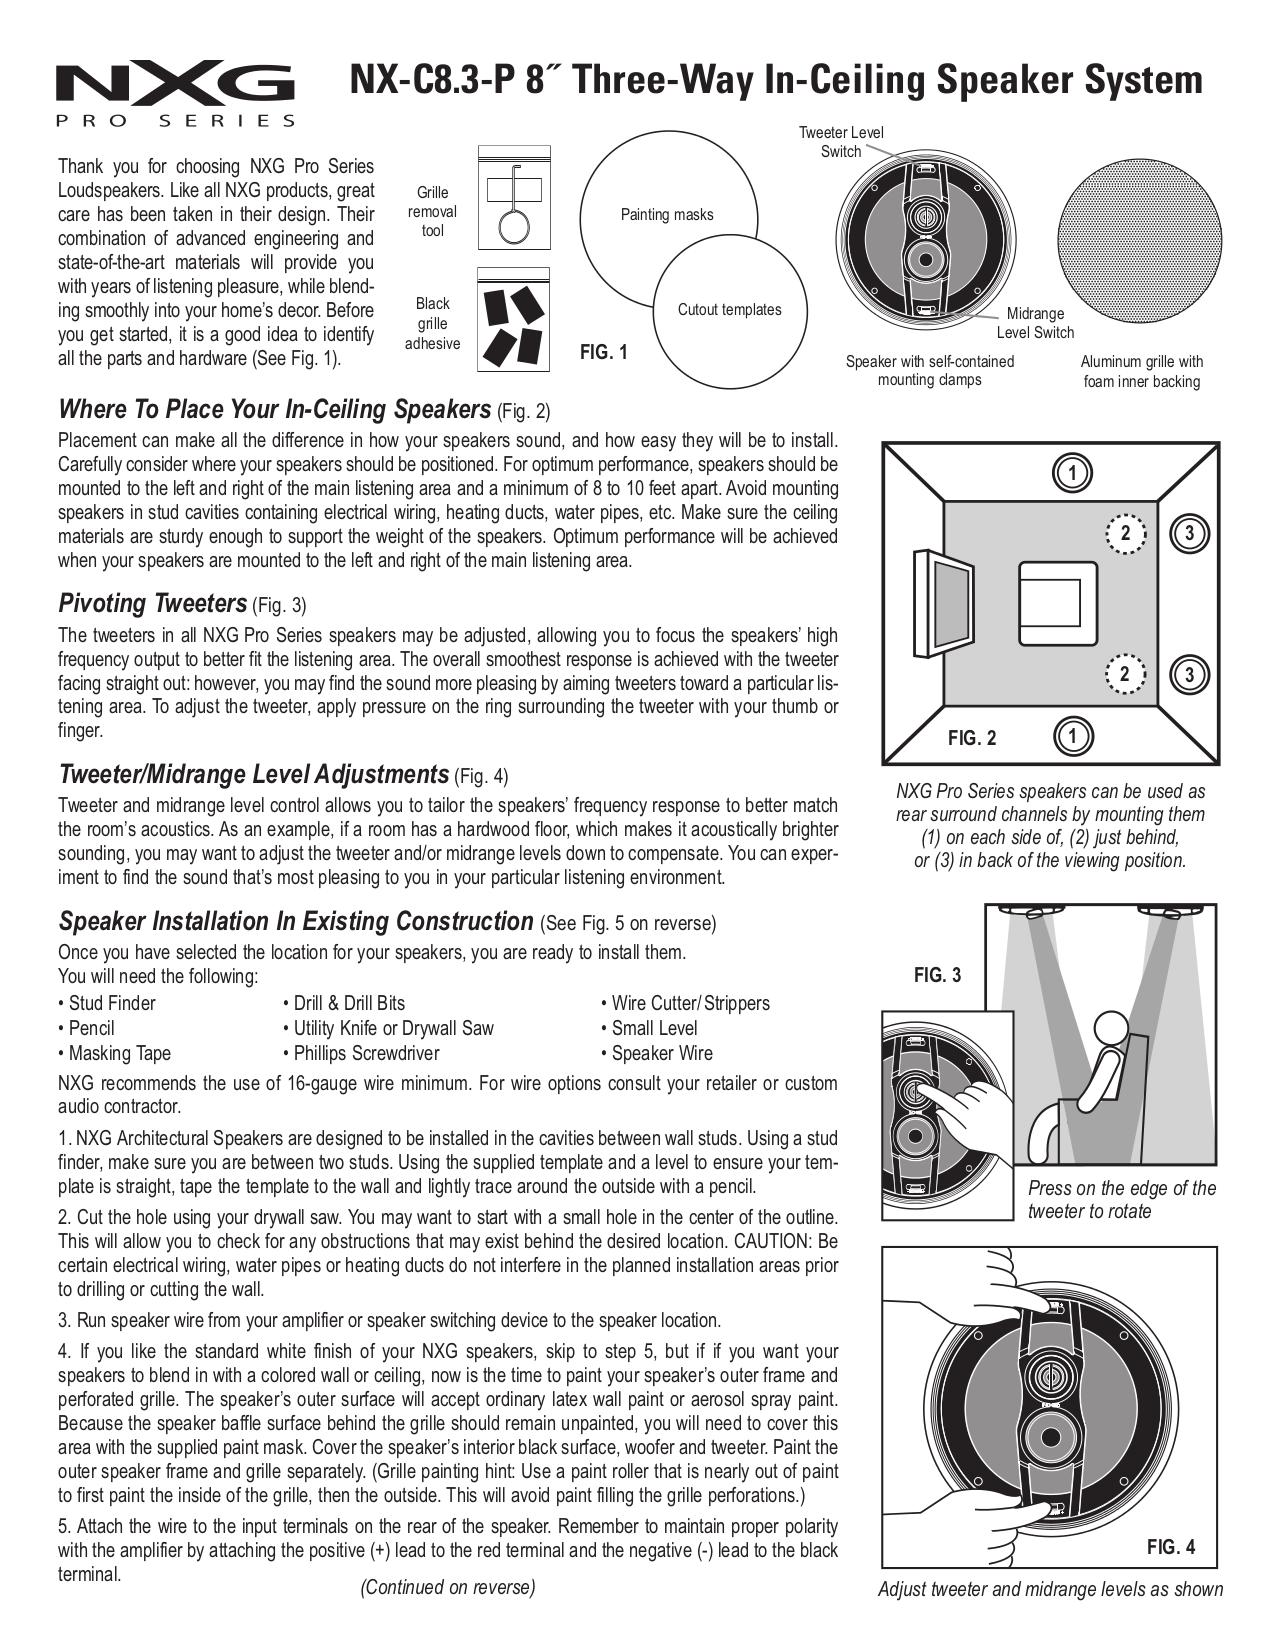 pdf for Nxg Speaker PRO 1030 manual